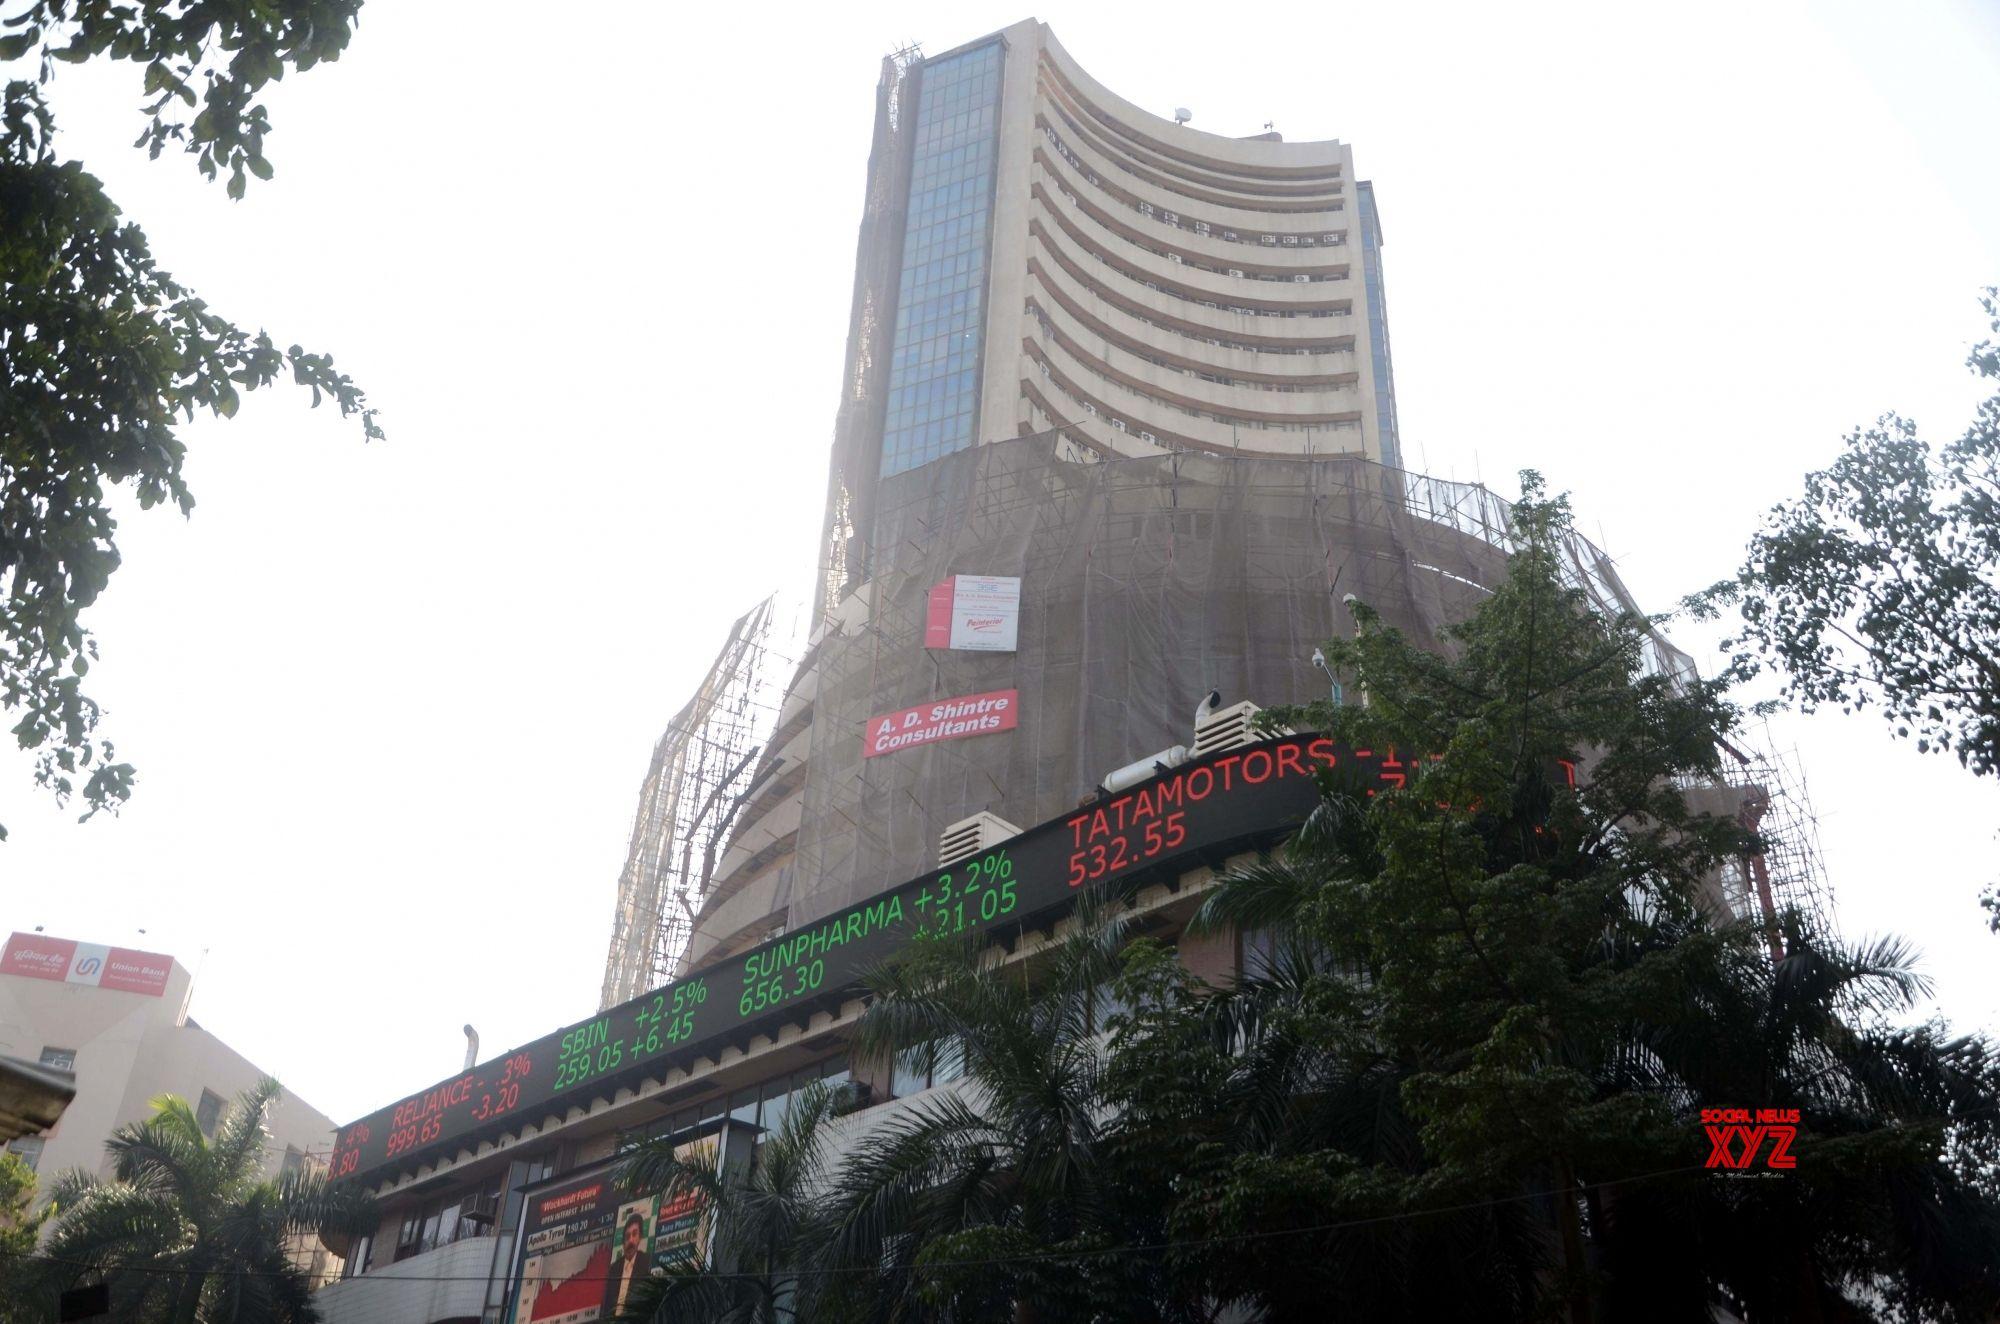 Trade cautiously in volatile market